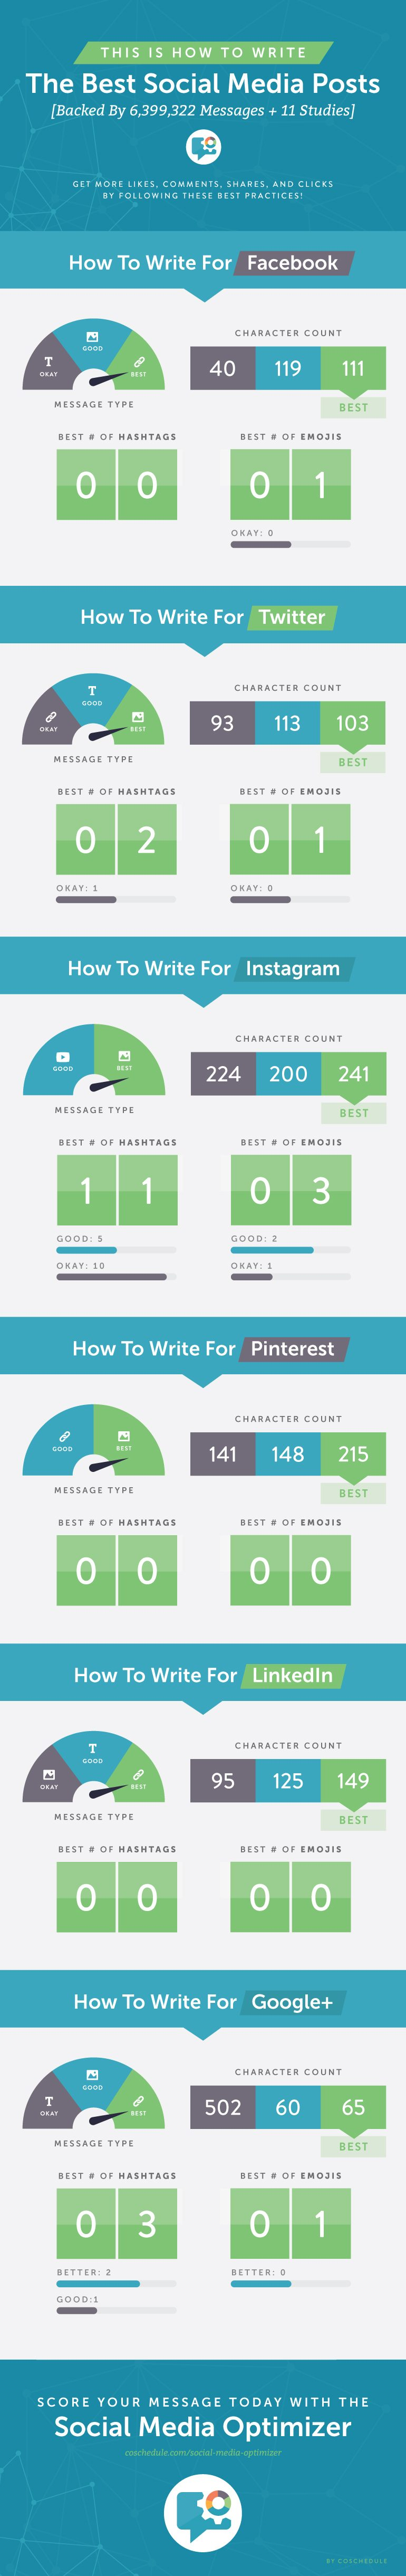 Social Media Posting Tips Infographic